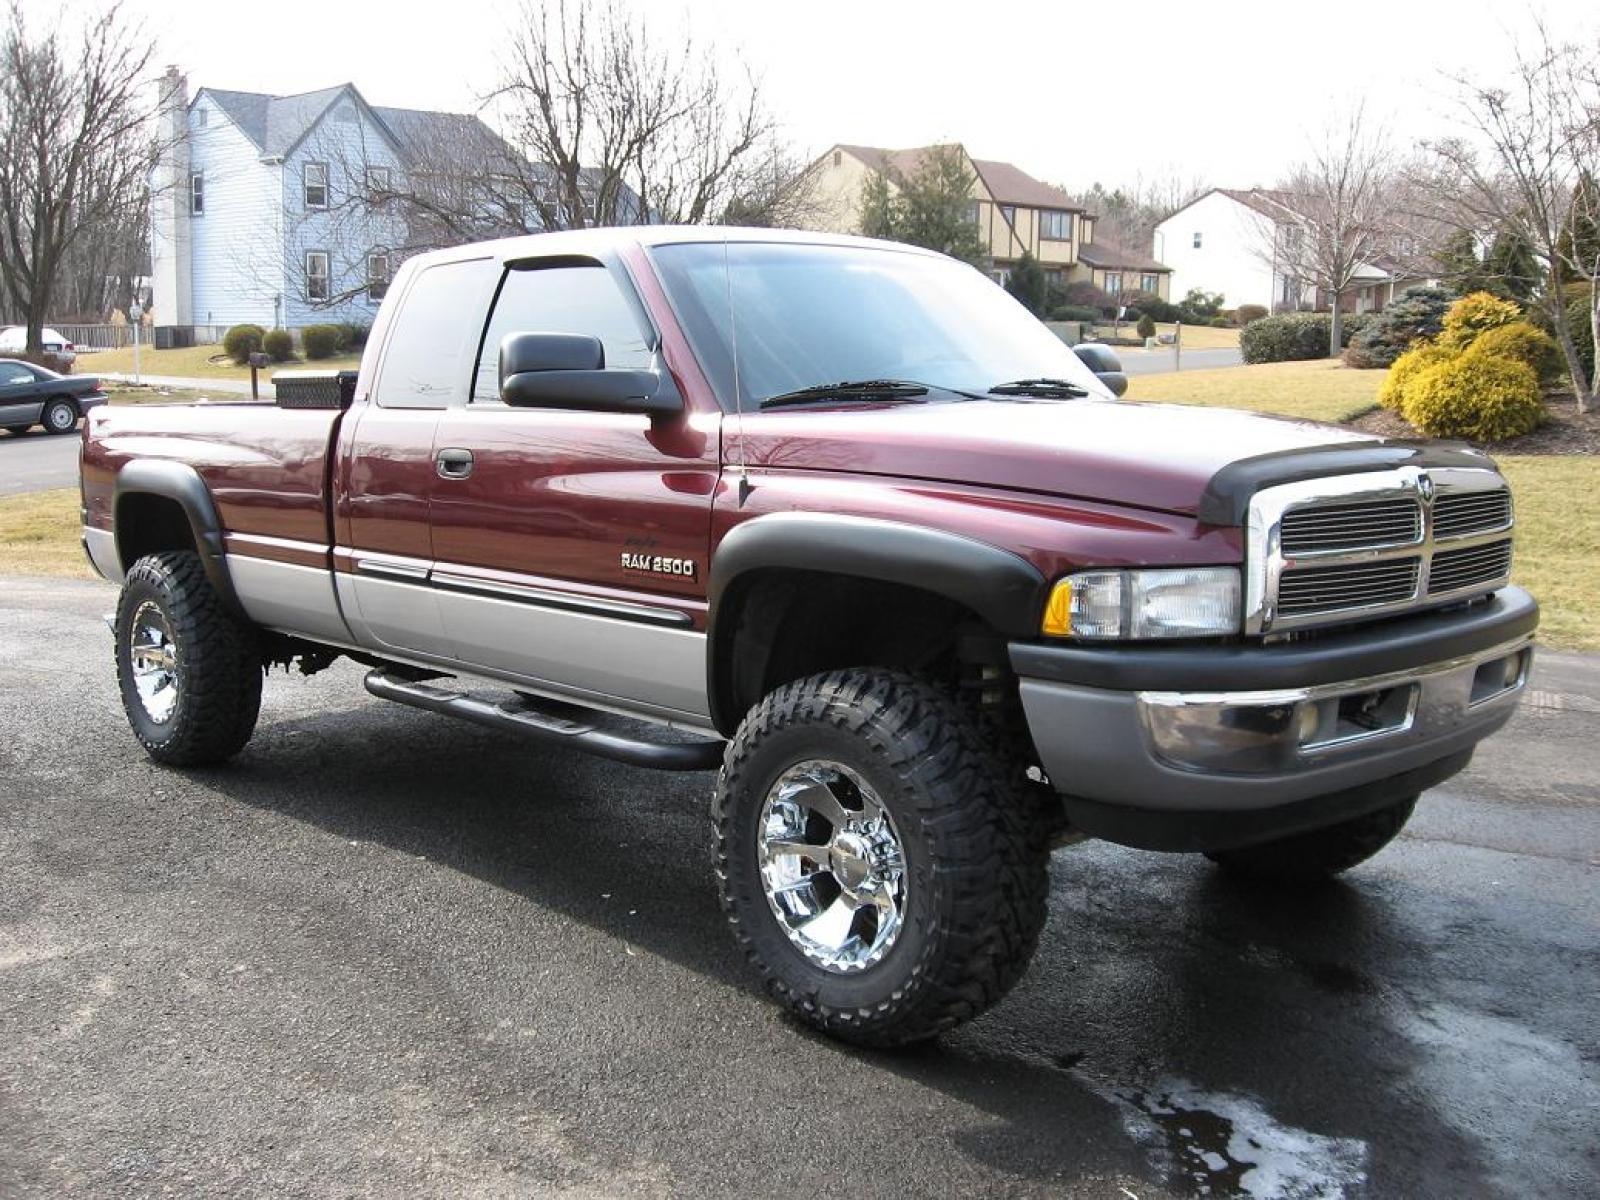 2004 dodge ram pickup 2500 1 800 1024 1280 1600 origin